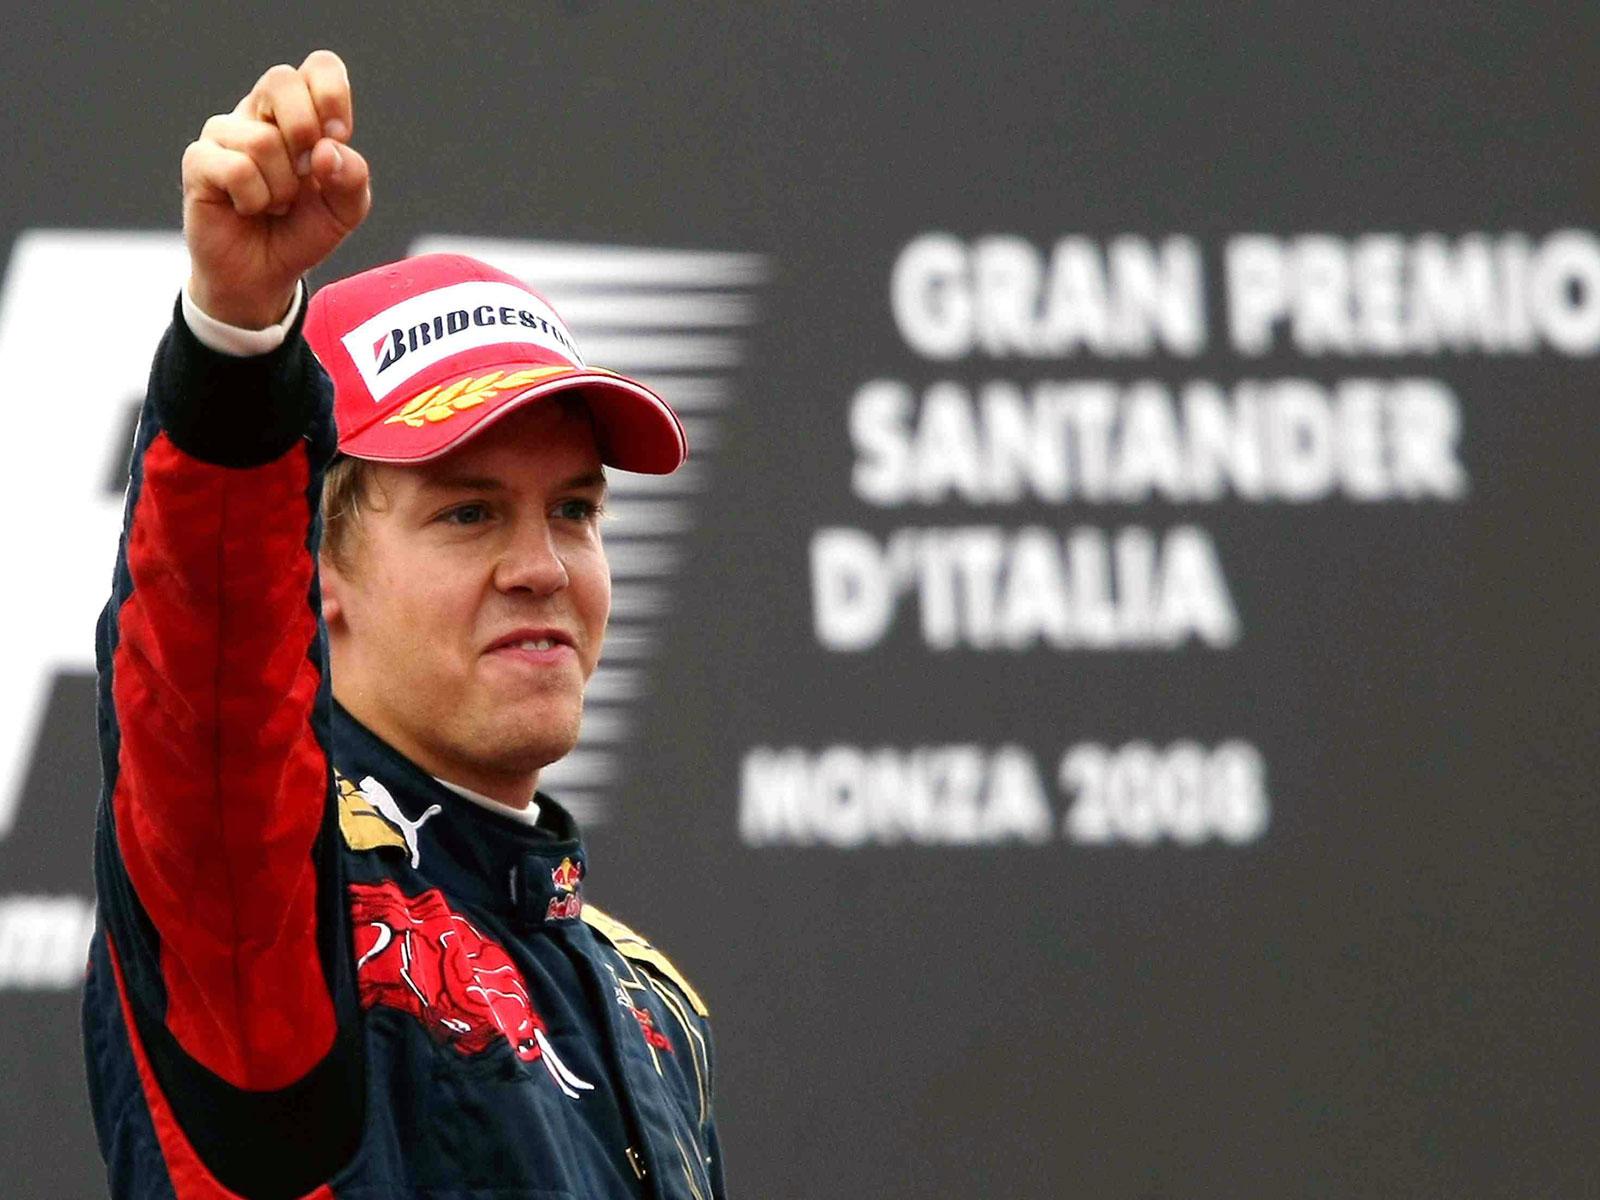 Гран-При Италии 2008, Монца. Себастьян Феттель